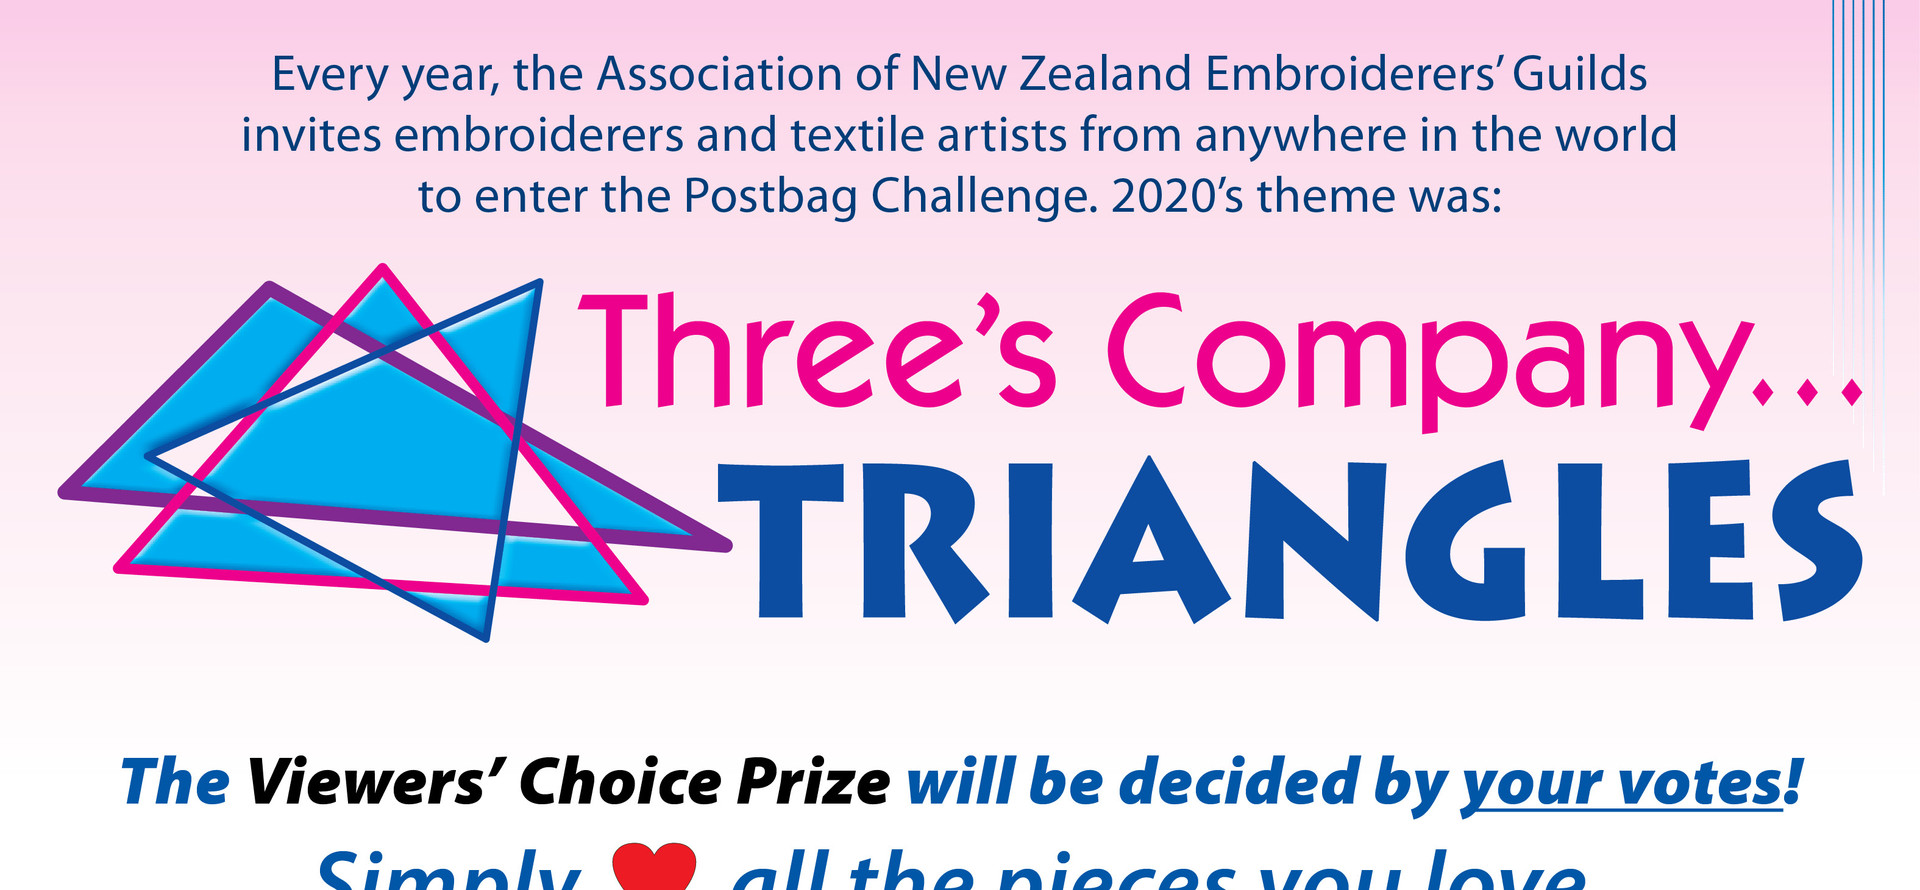 ANZEG Postbag Challenge 2020: Three's Company...Triangles